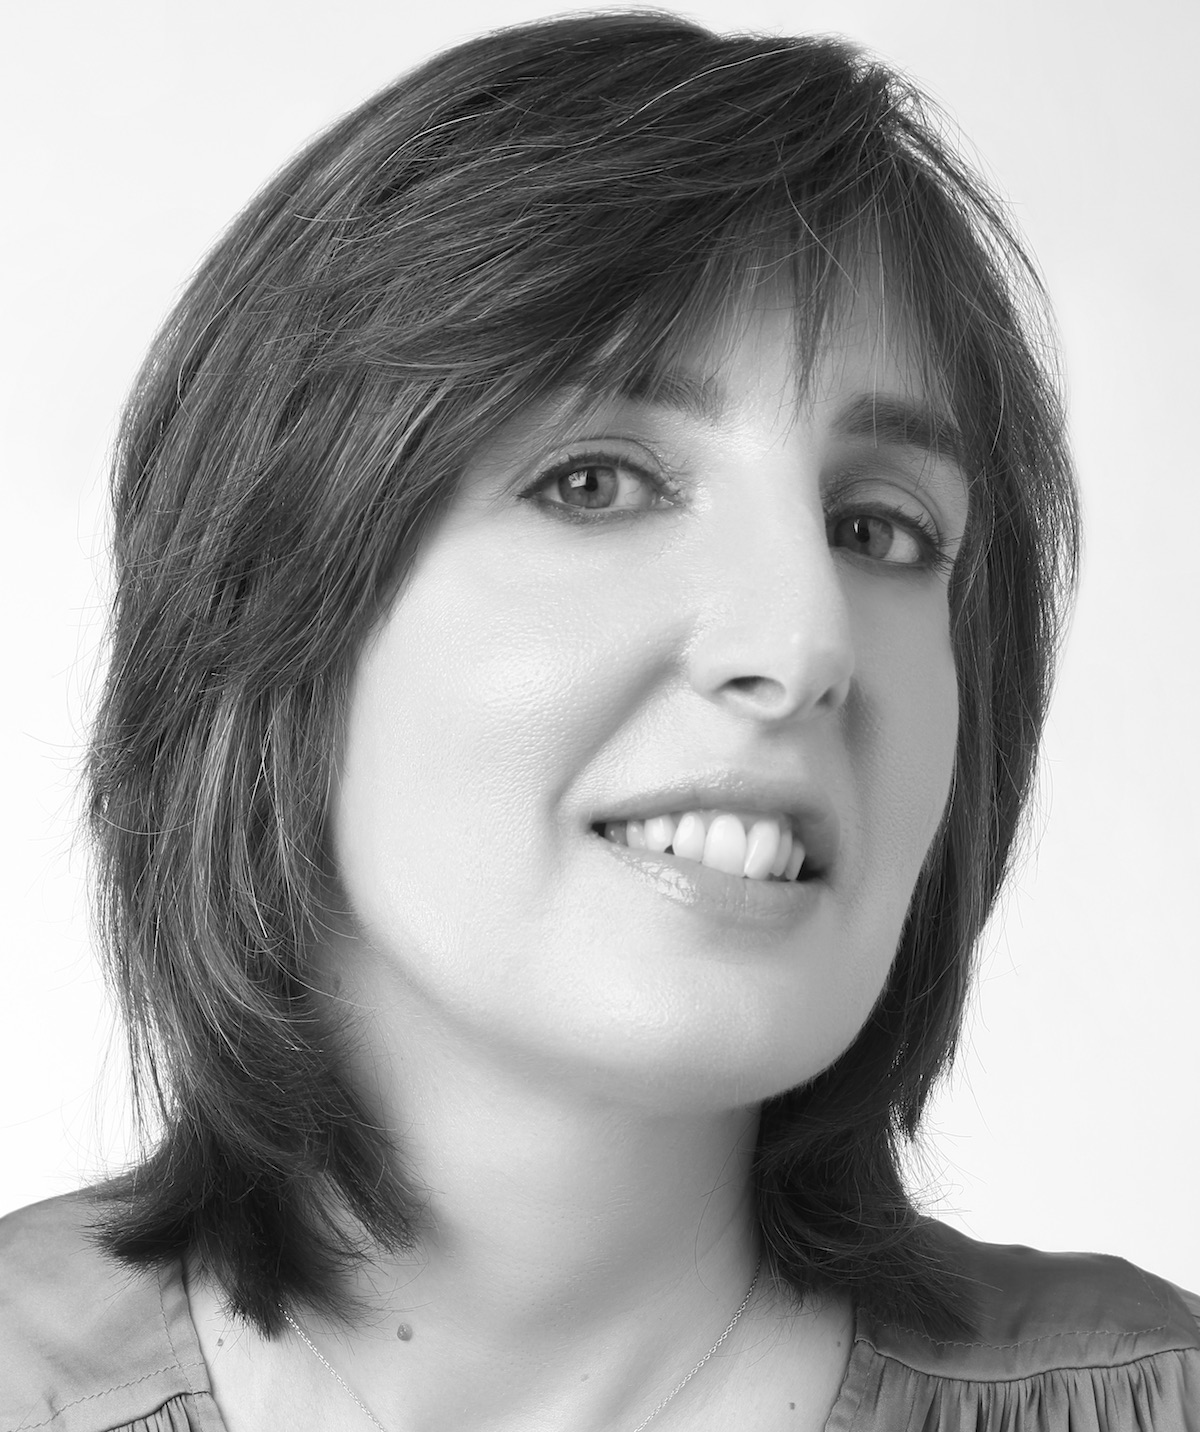 Rana Haddad portrait